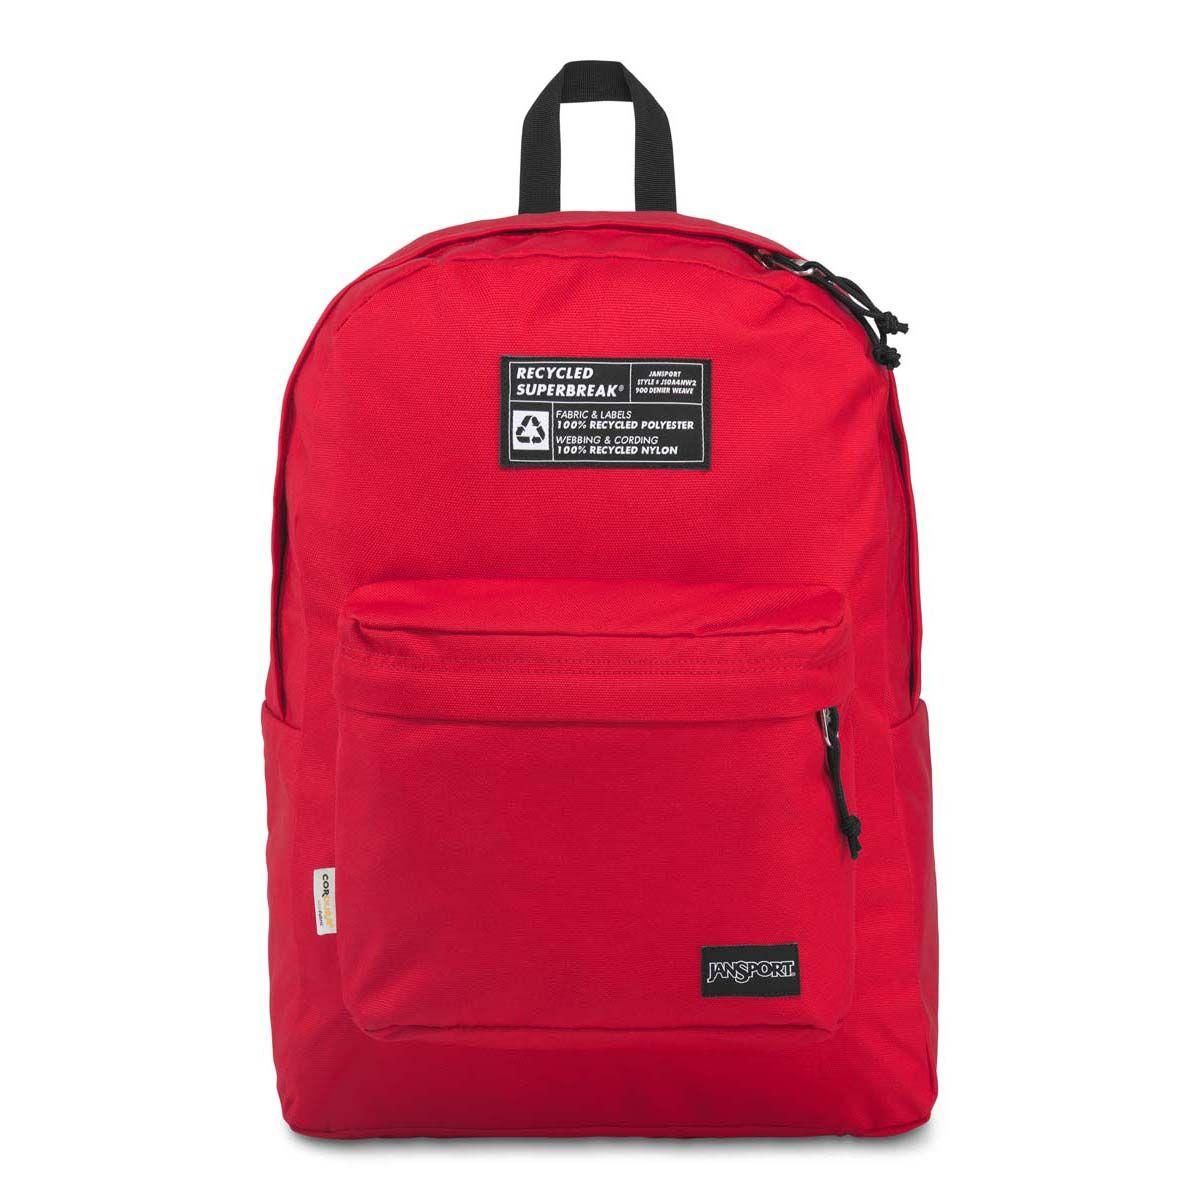 JanSport Recycled SuperBreak® Backpack in Red Tape